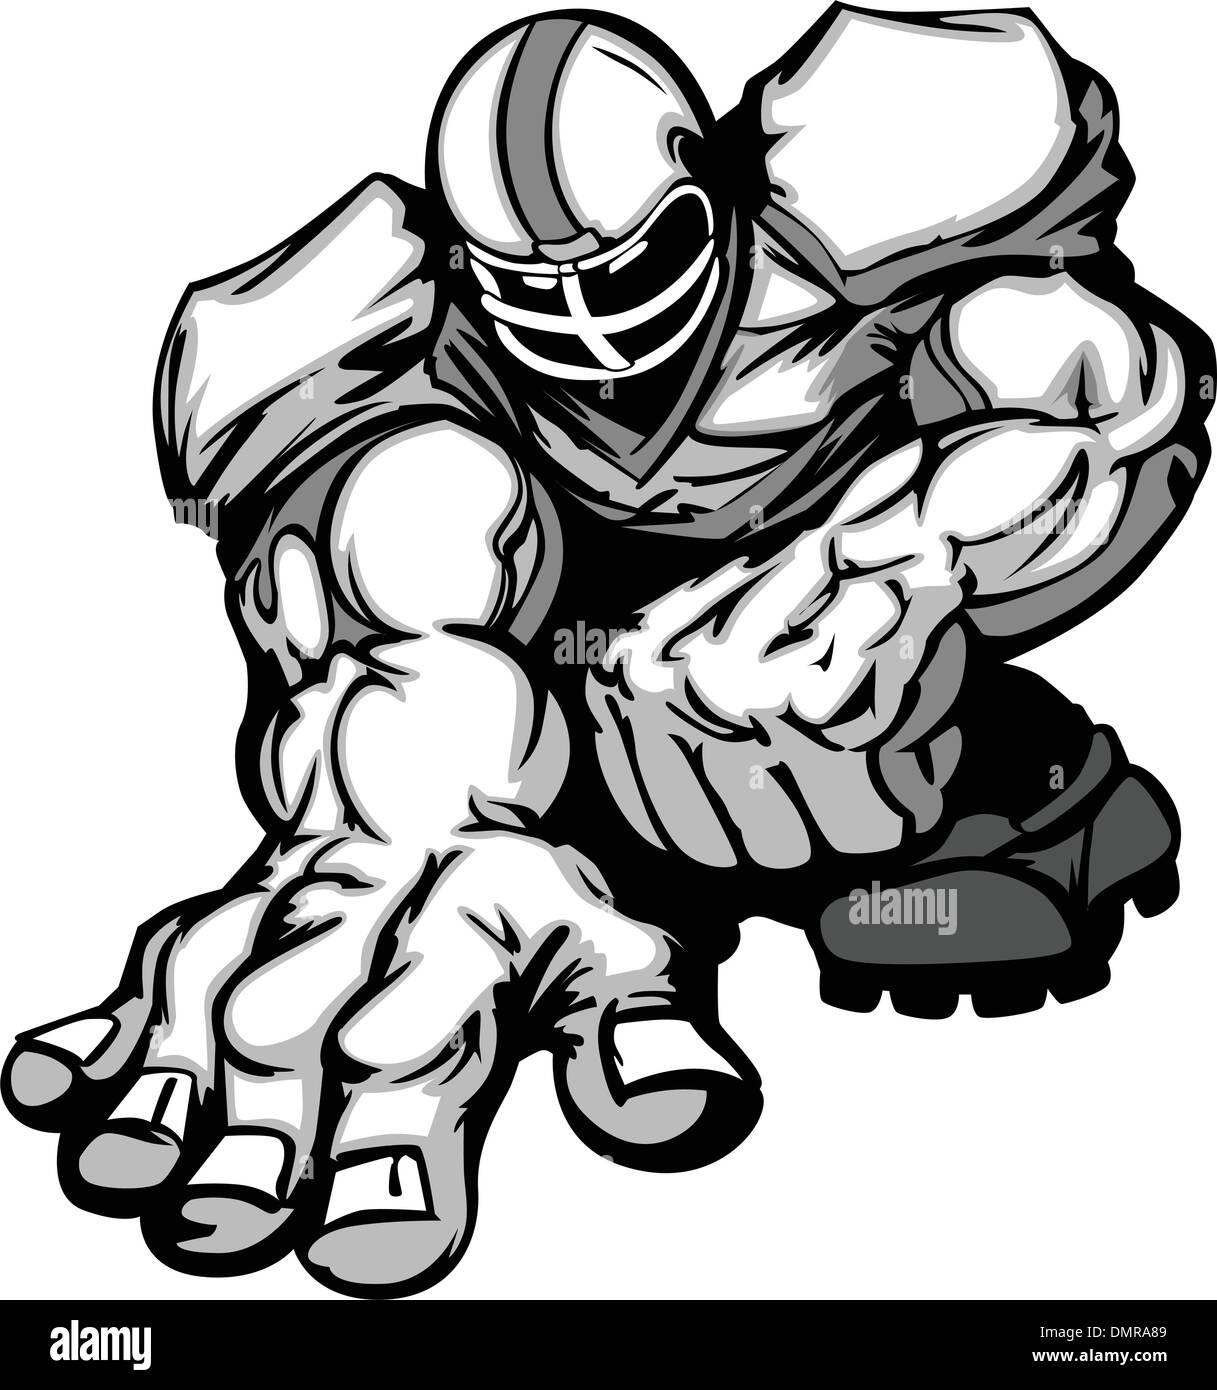 Fußball Spieler Lineman Vector Cartoon Stockbild